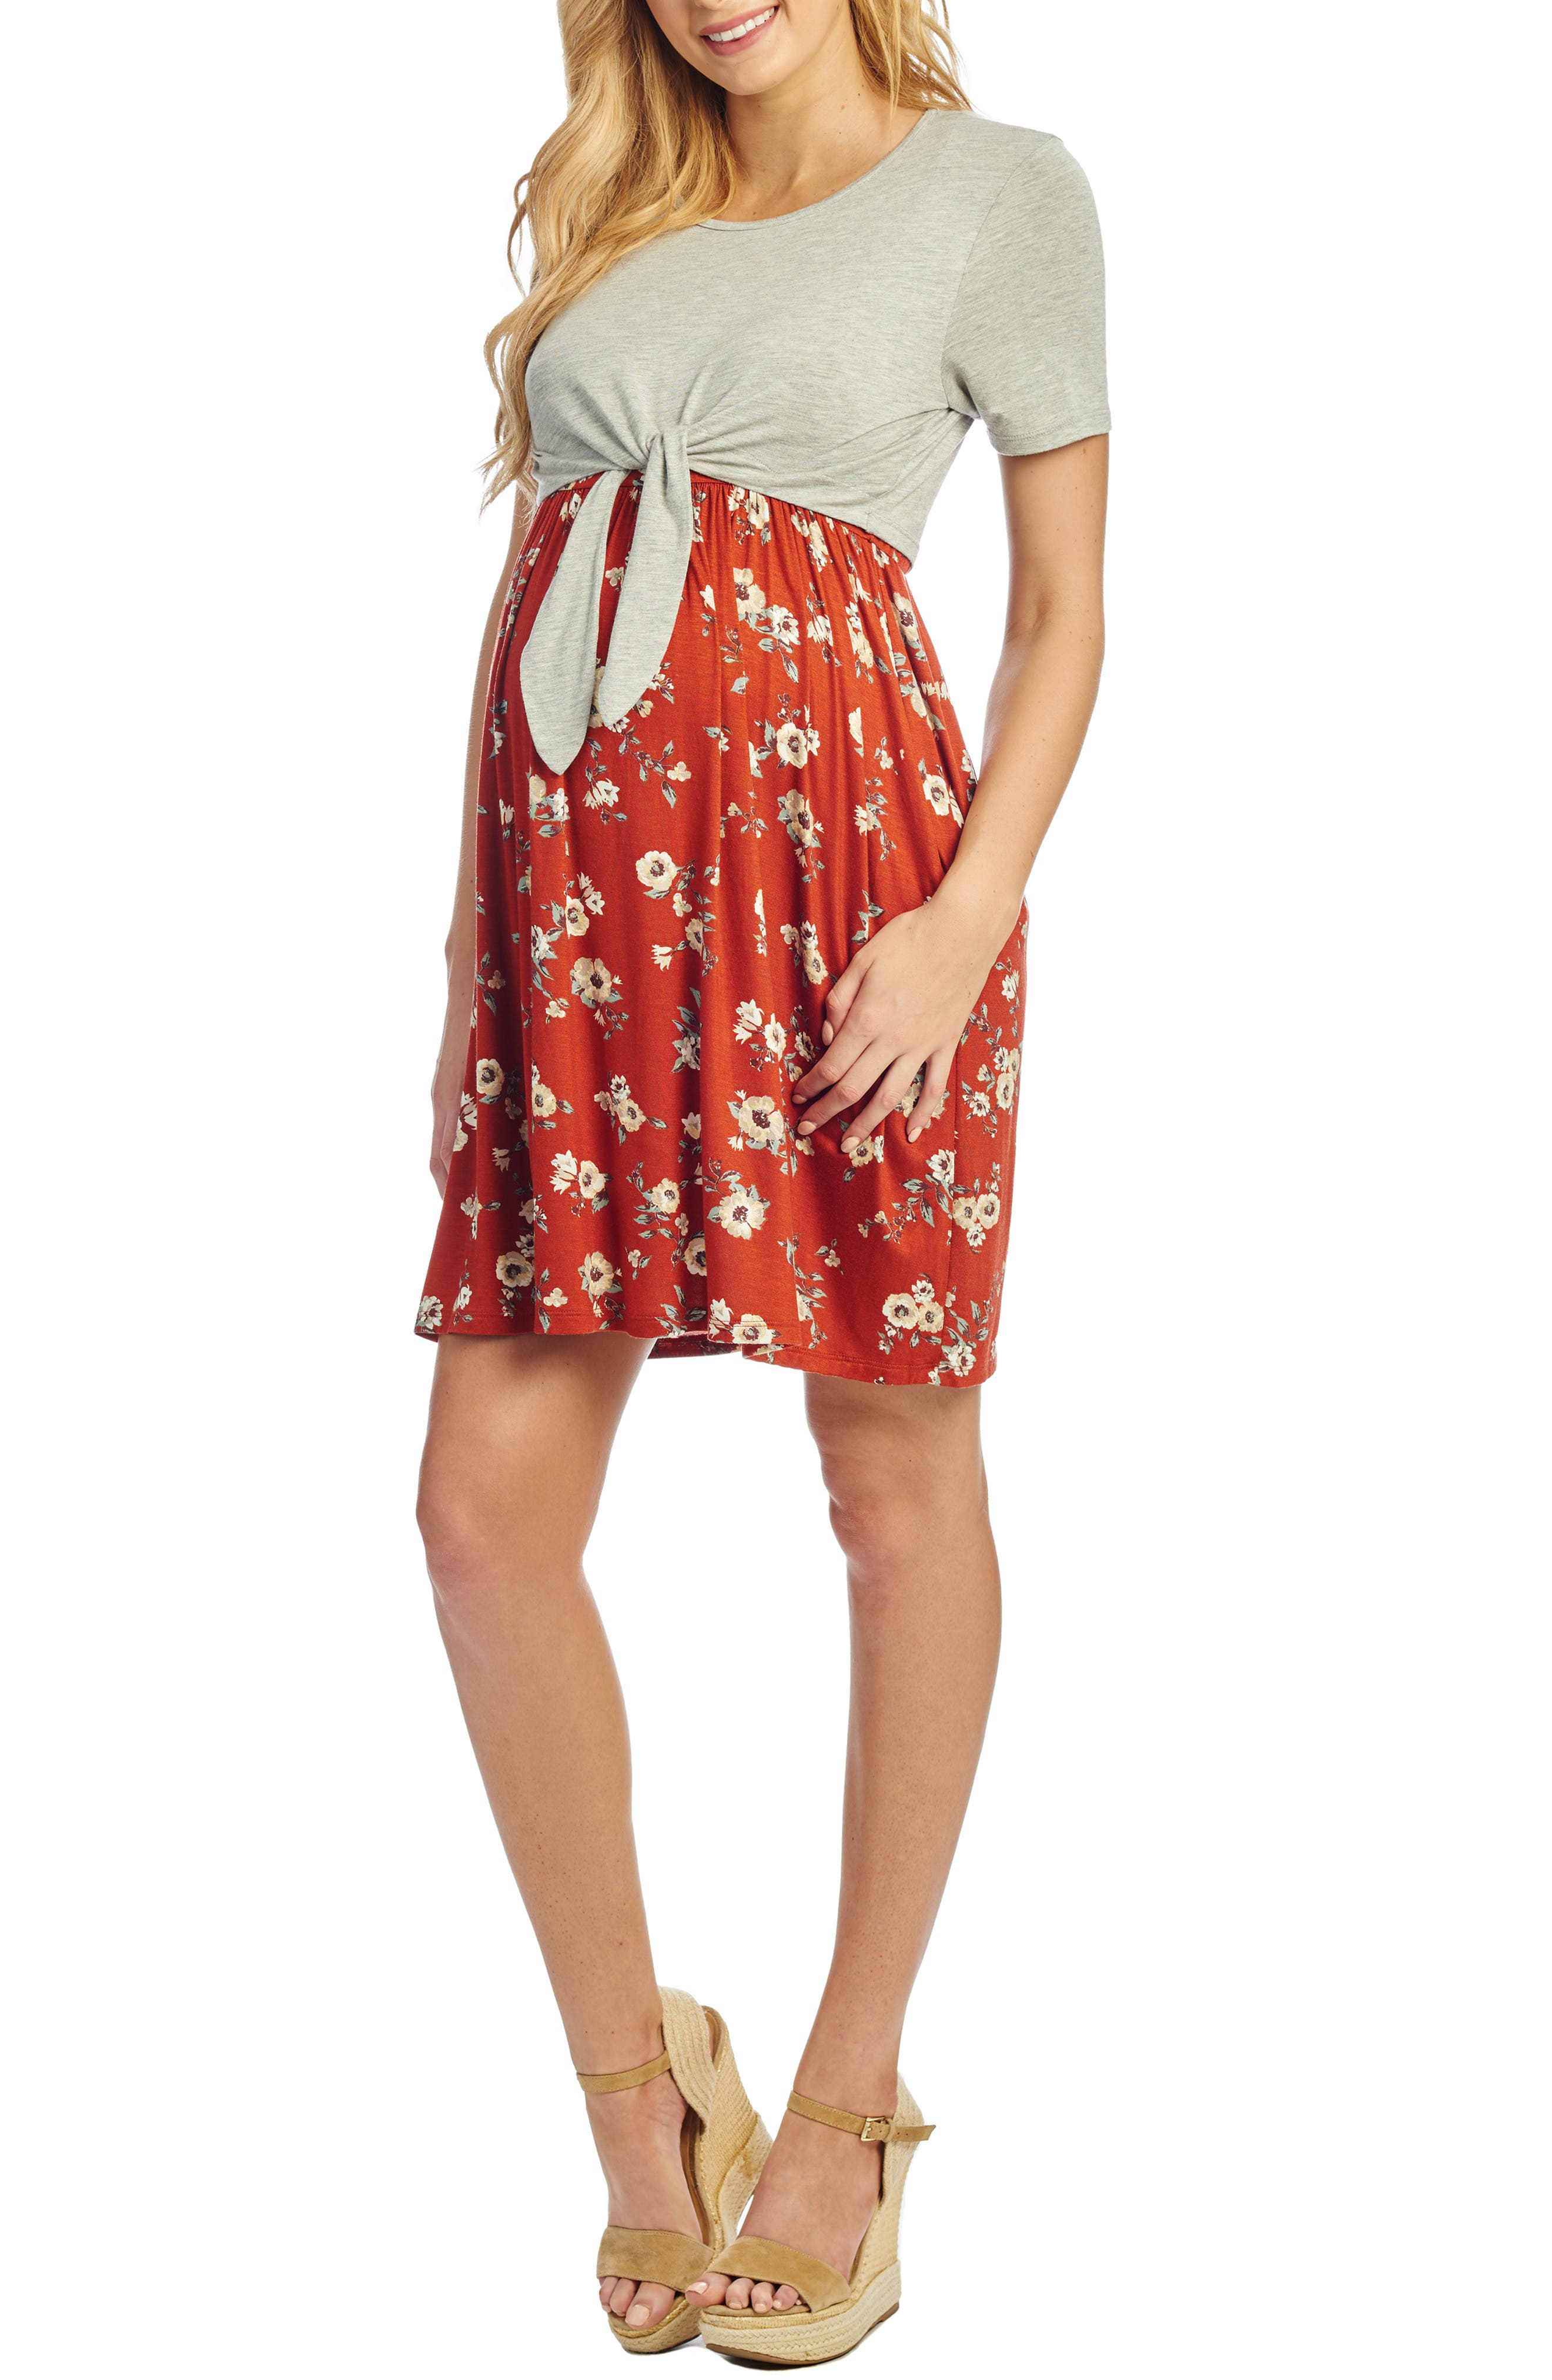 Everly Grey Lehua Maternity/nursing Babydoll Dress, Red